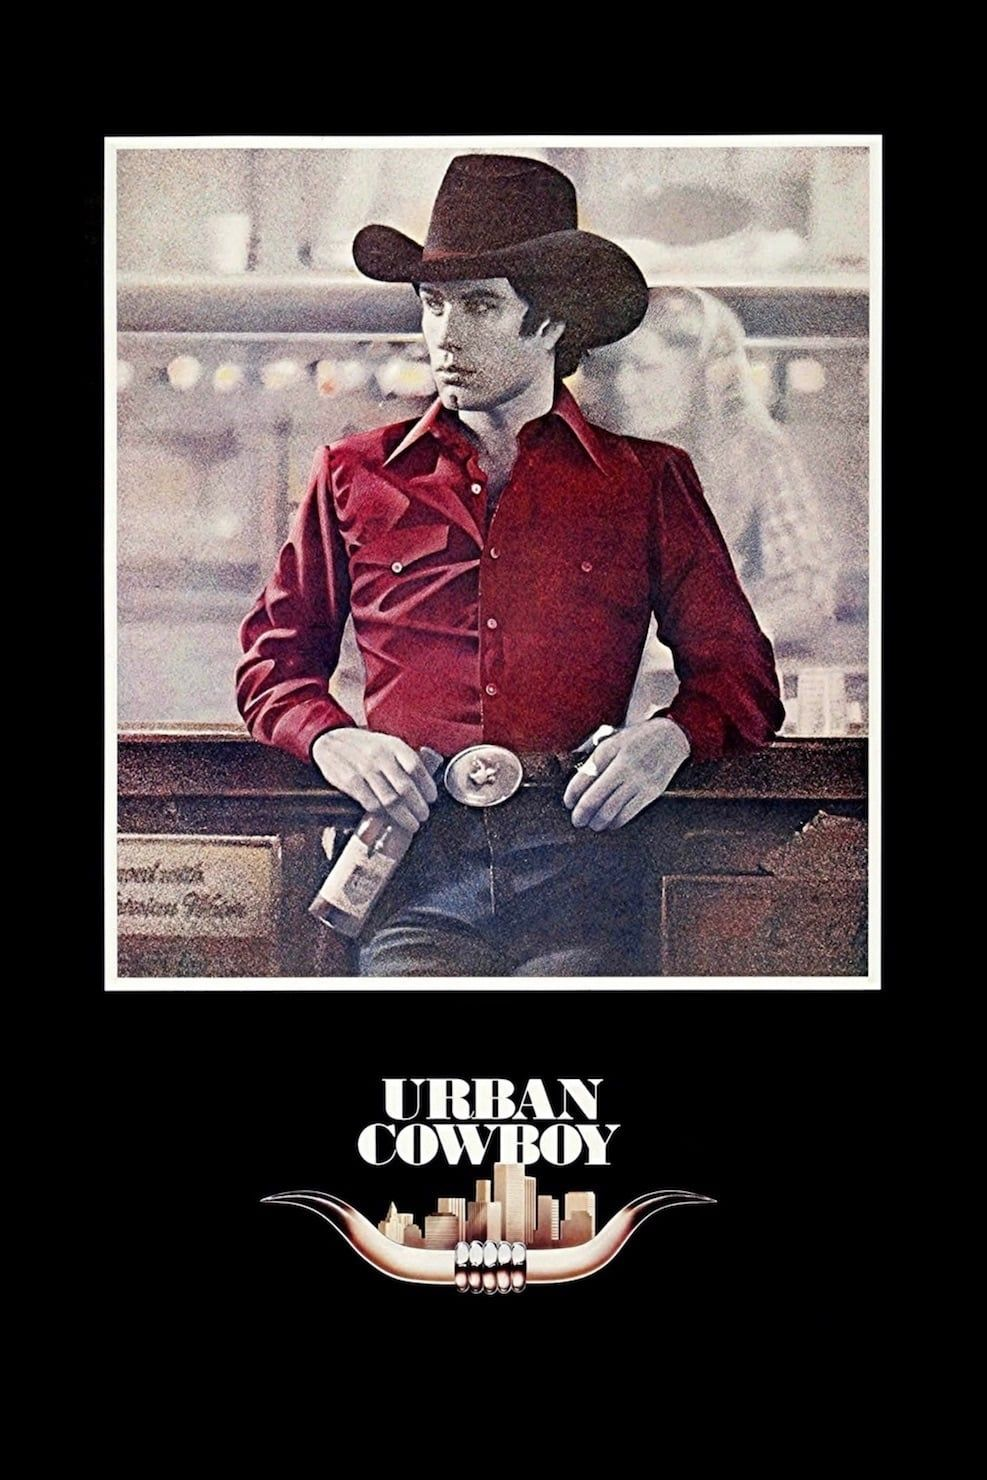 .Urban Cowboy FULL MOVIE Streaming Online in HD720p Video